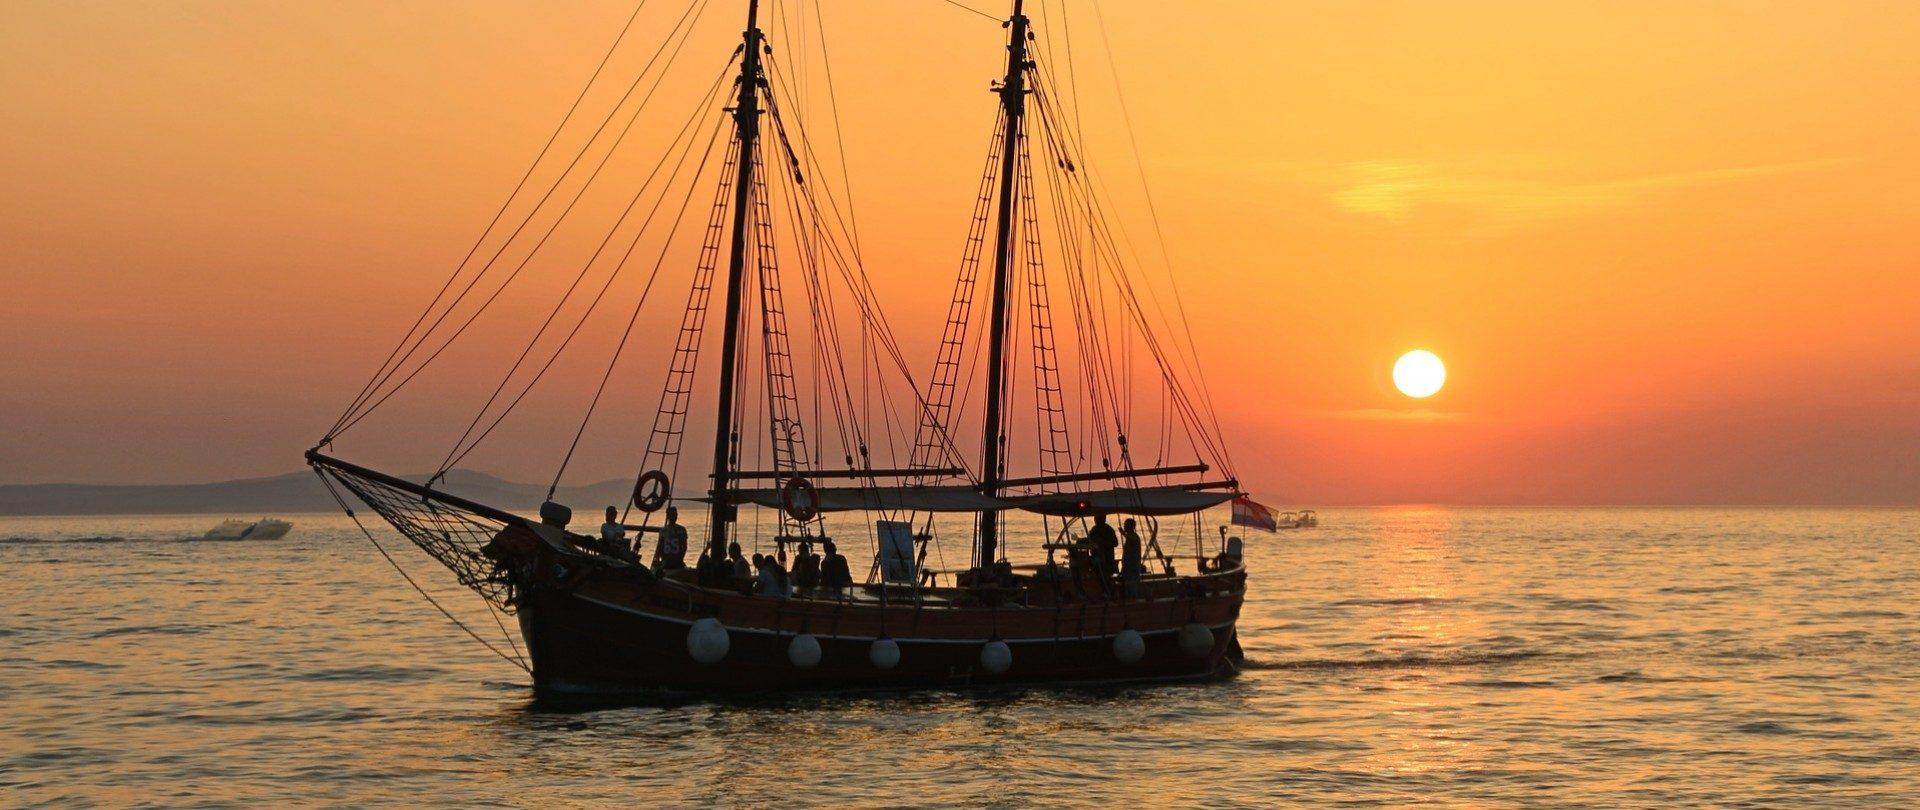 Rezydencja Morski Tygiel, Łeba